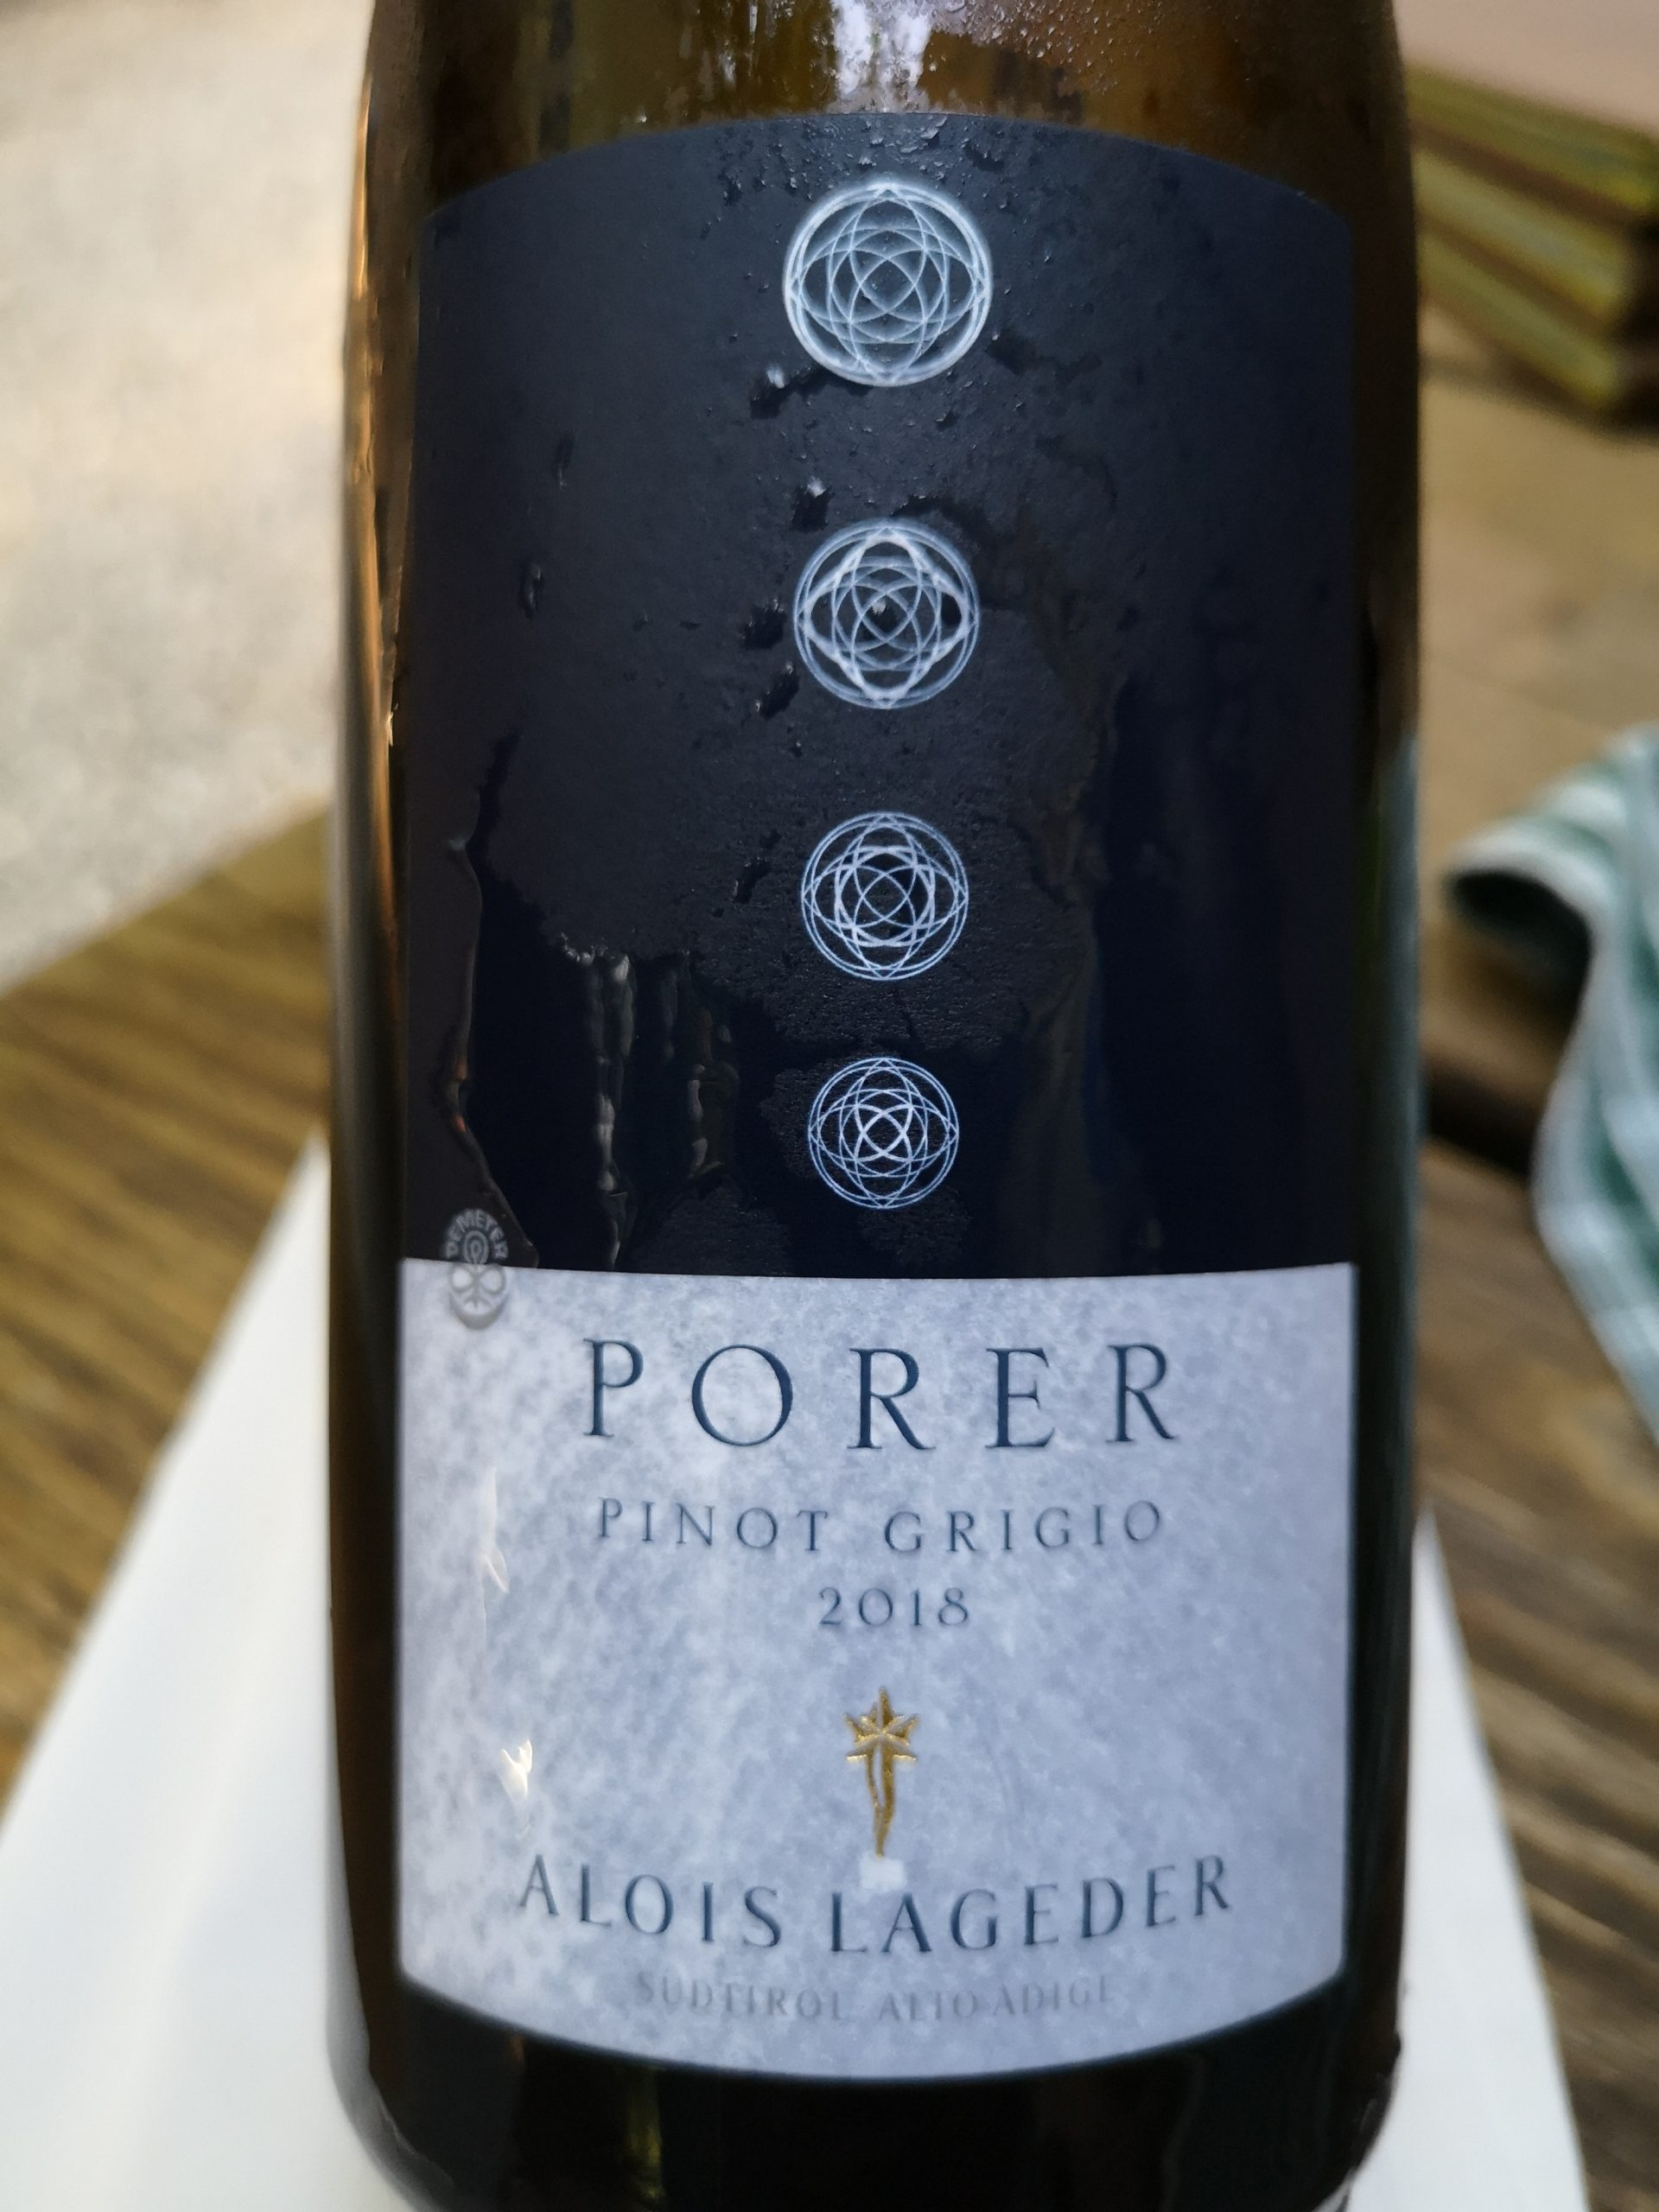 2018 Pinot Grigio Porer | Alois Lageder